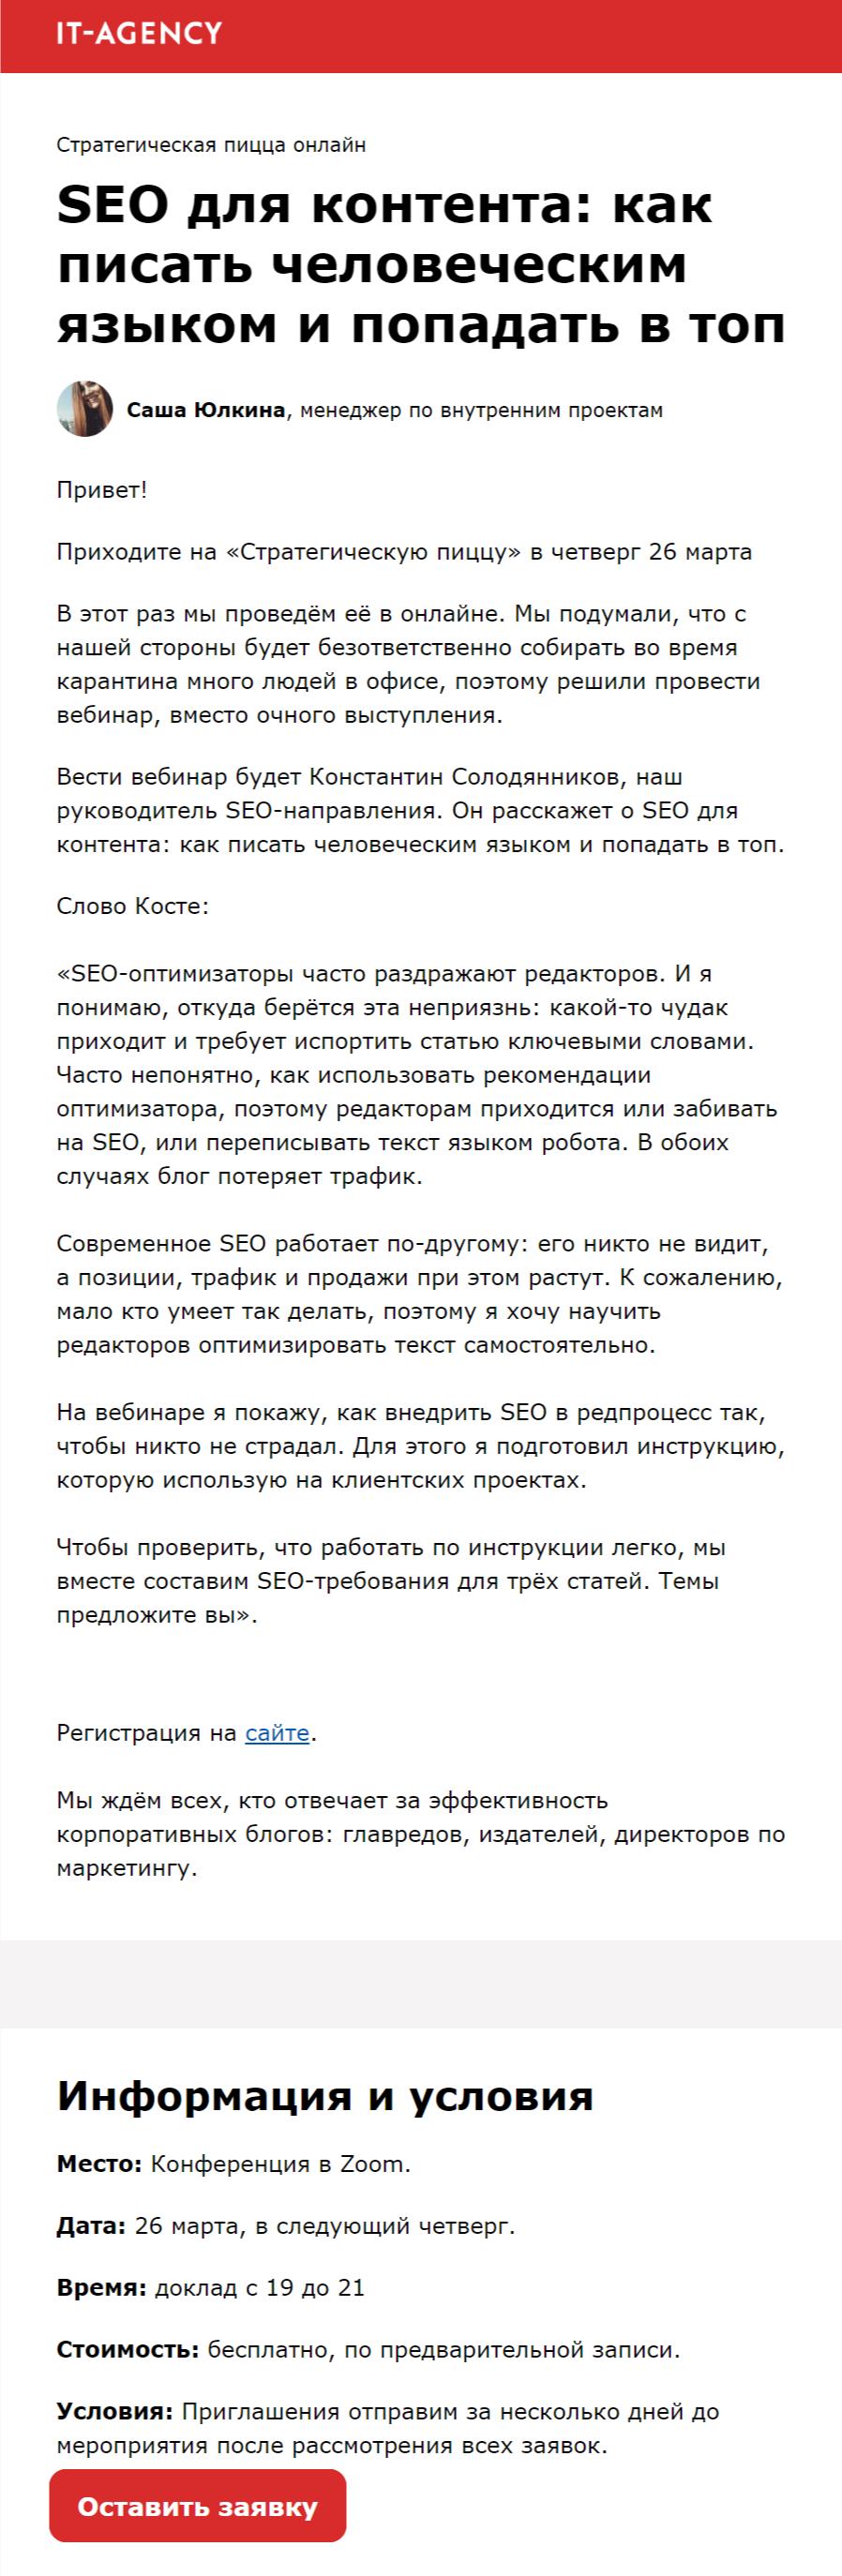 Письмо про перенос мероприятия в онлайн